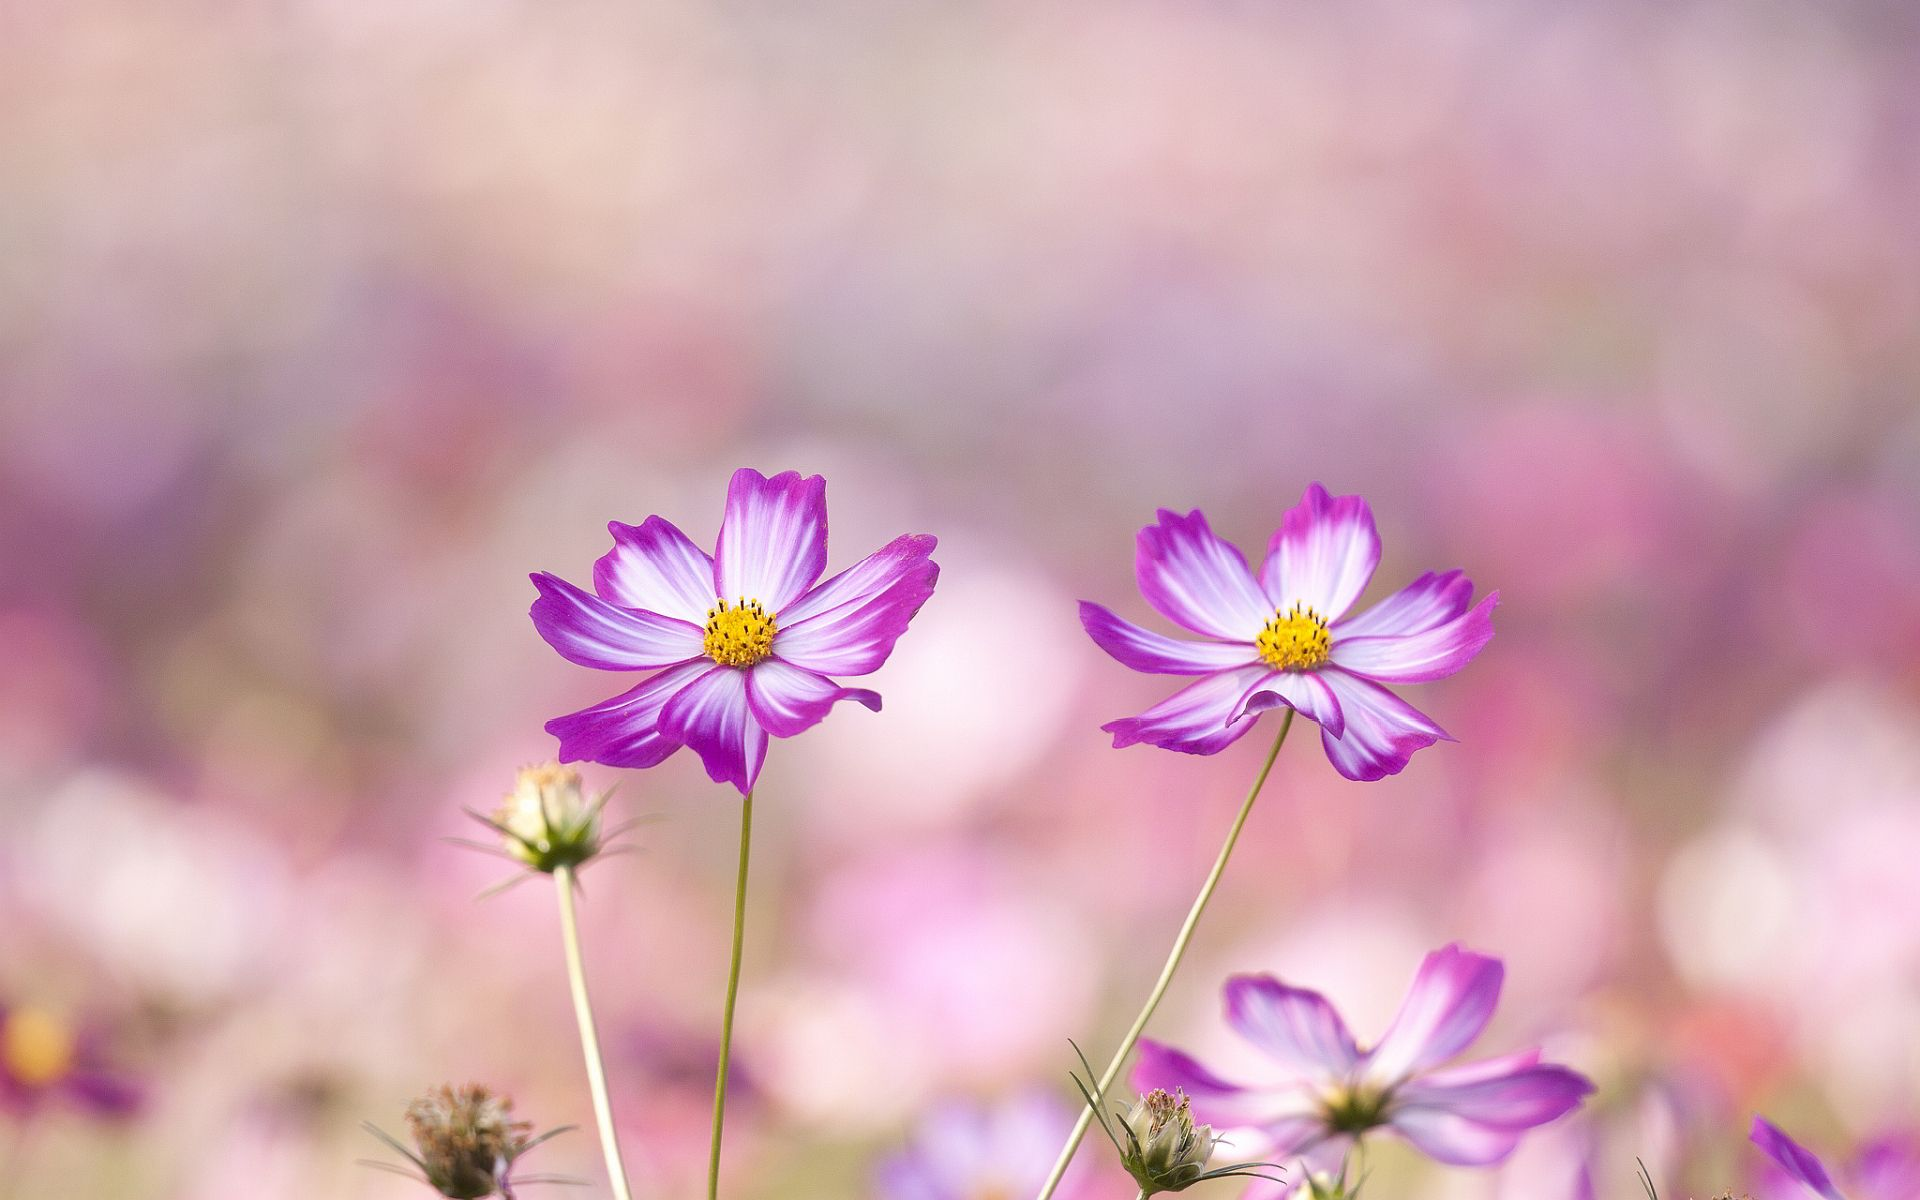 Summer Flowers Wallpaper Hd Desktop Widescreen For Mobile Tumblr